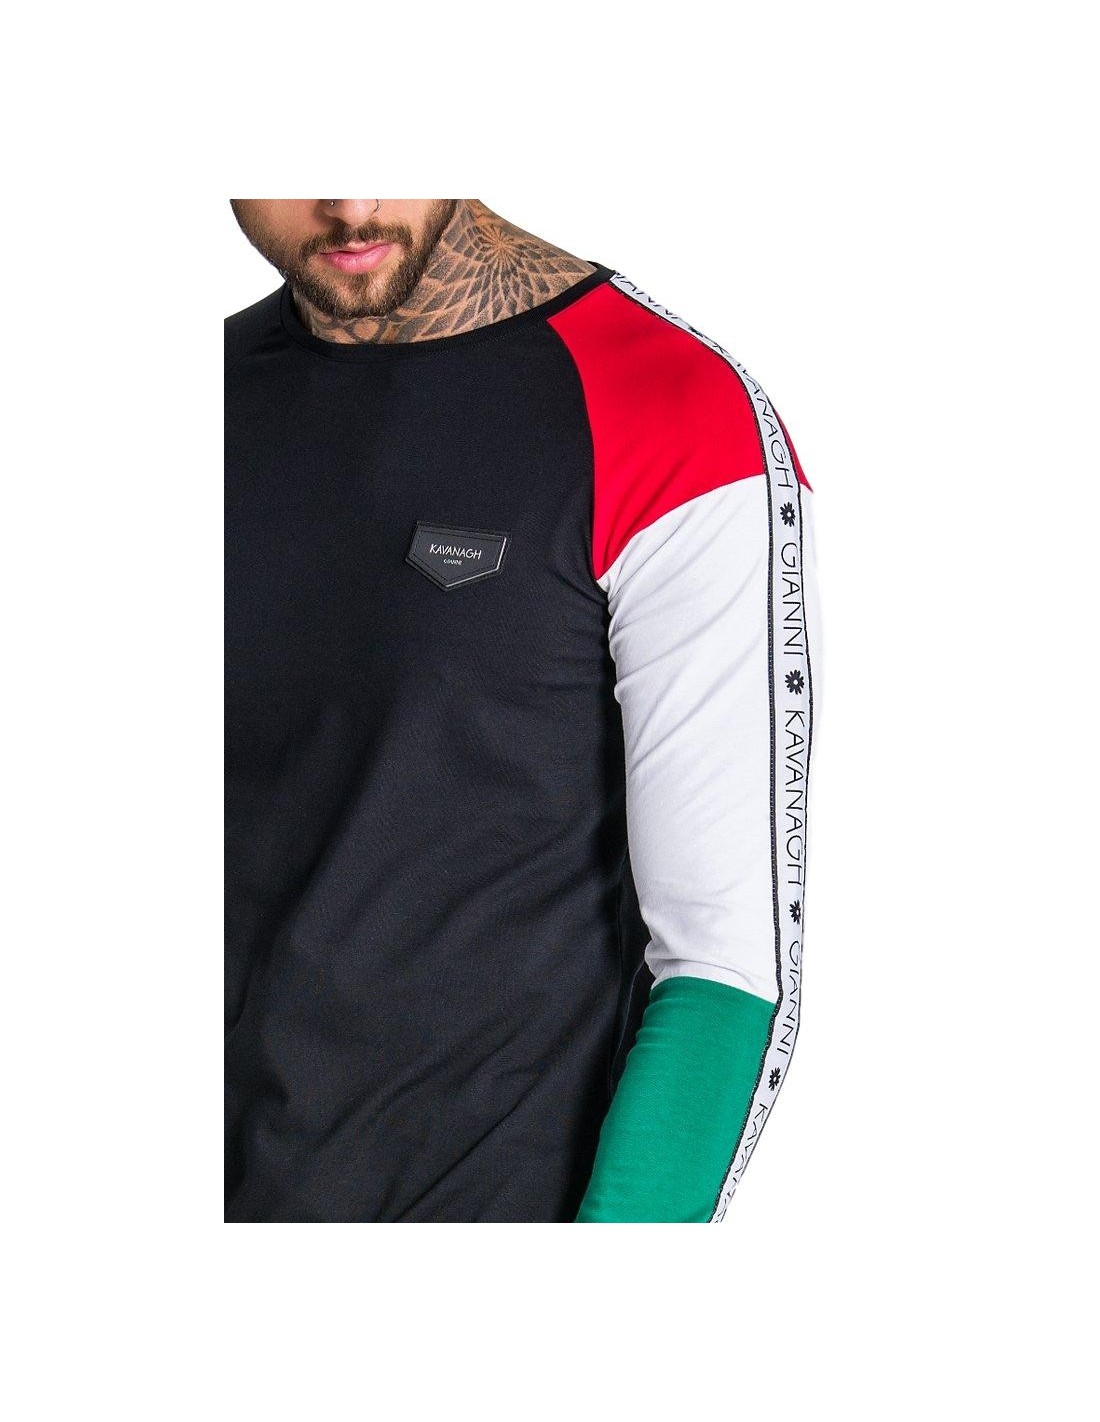 T-shirt Gianni Kavanagh Block Asymmetrical GK